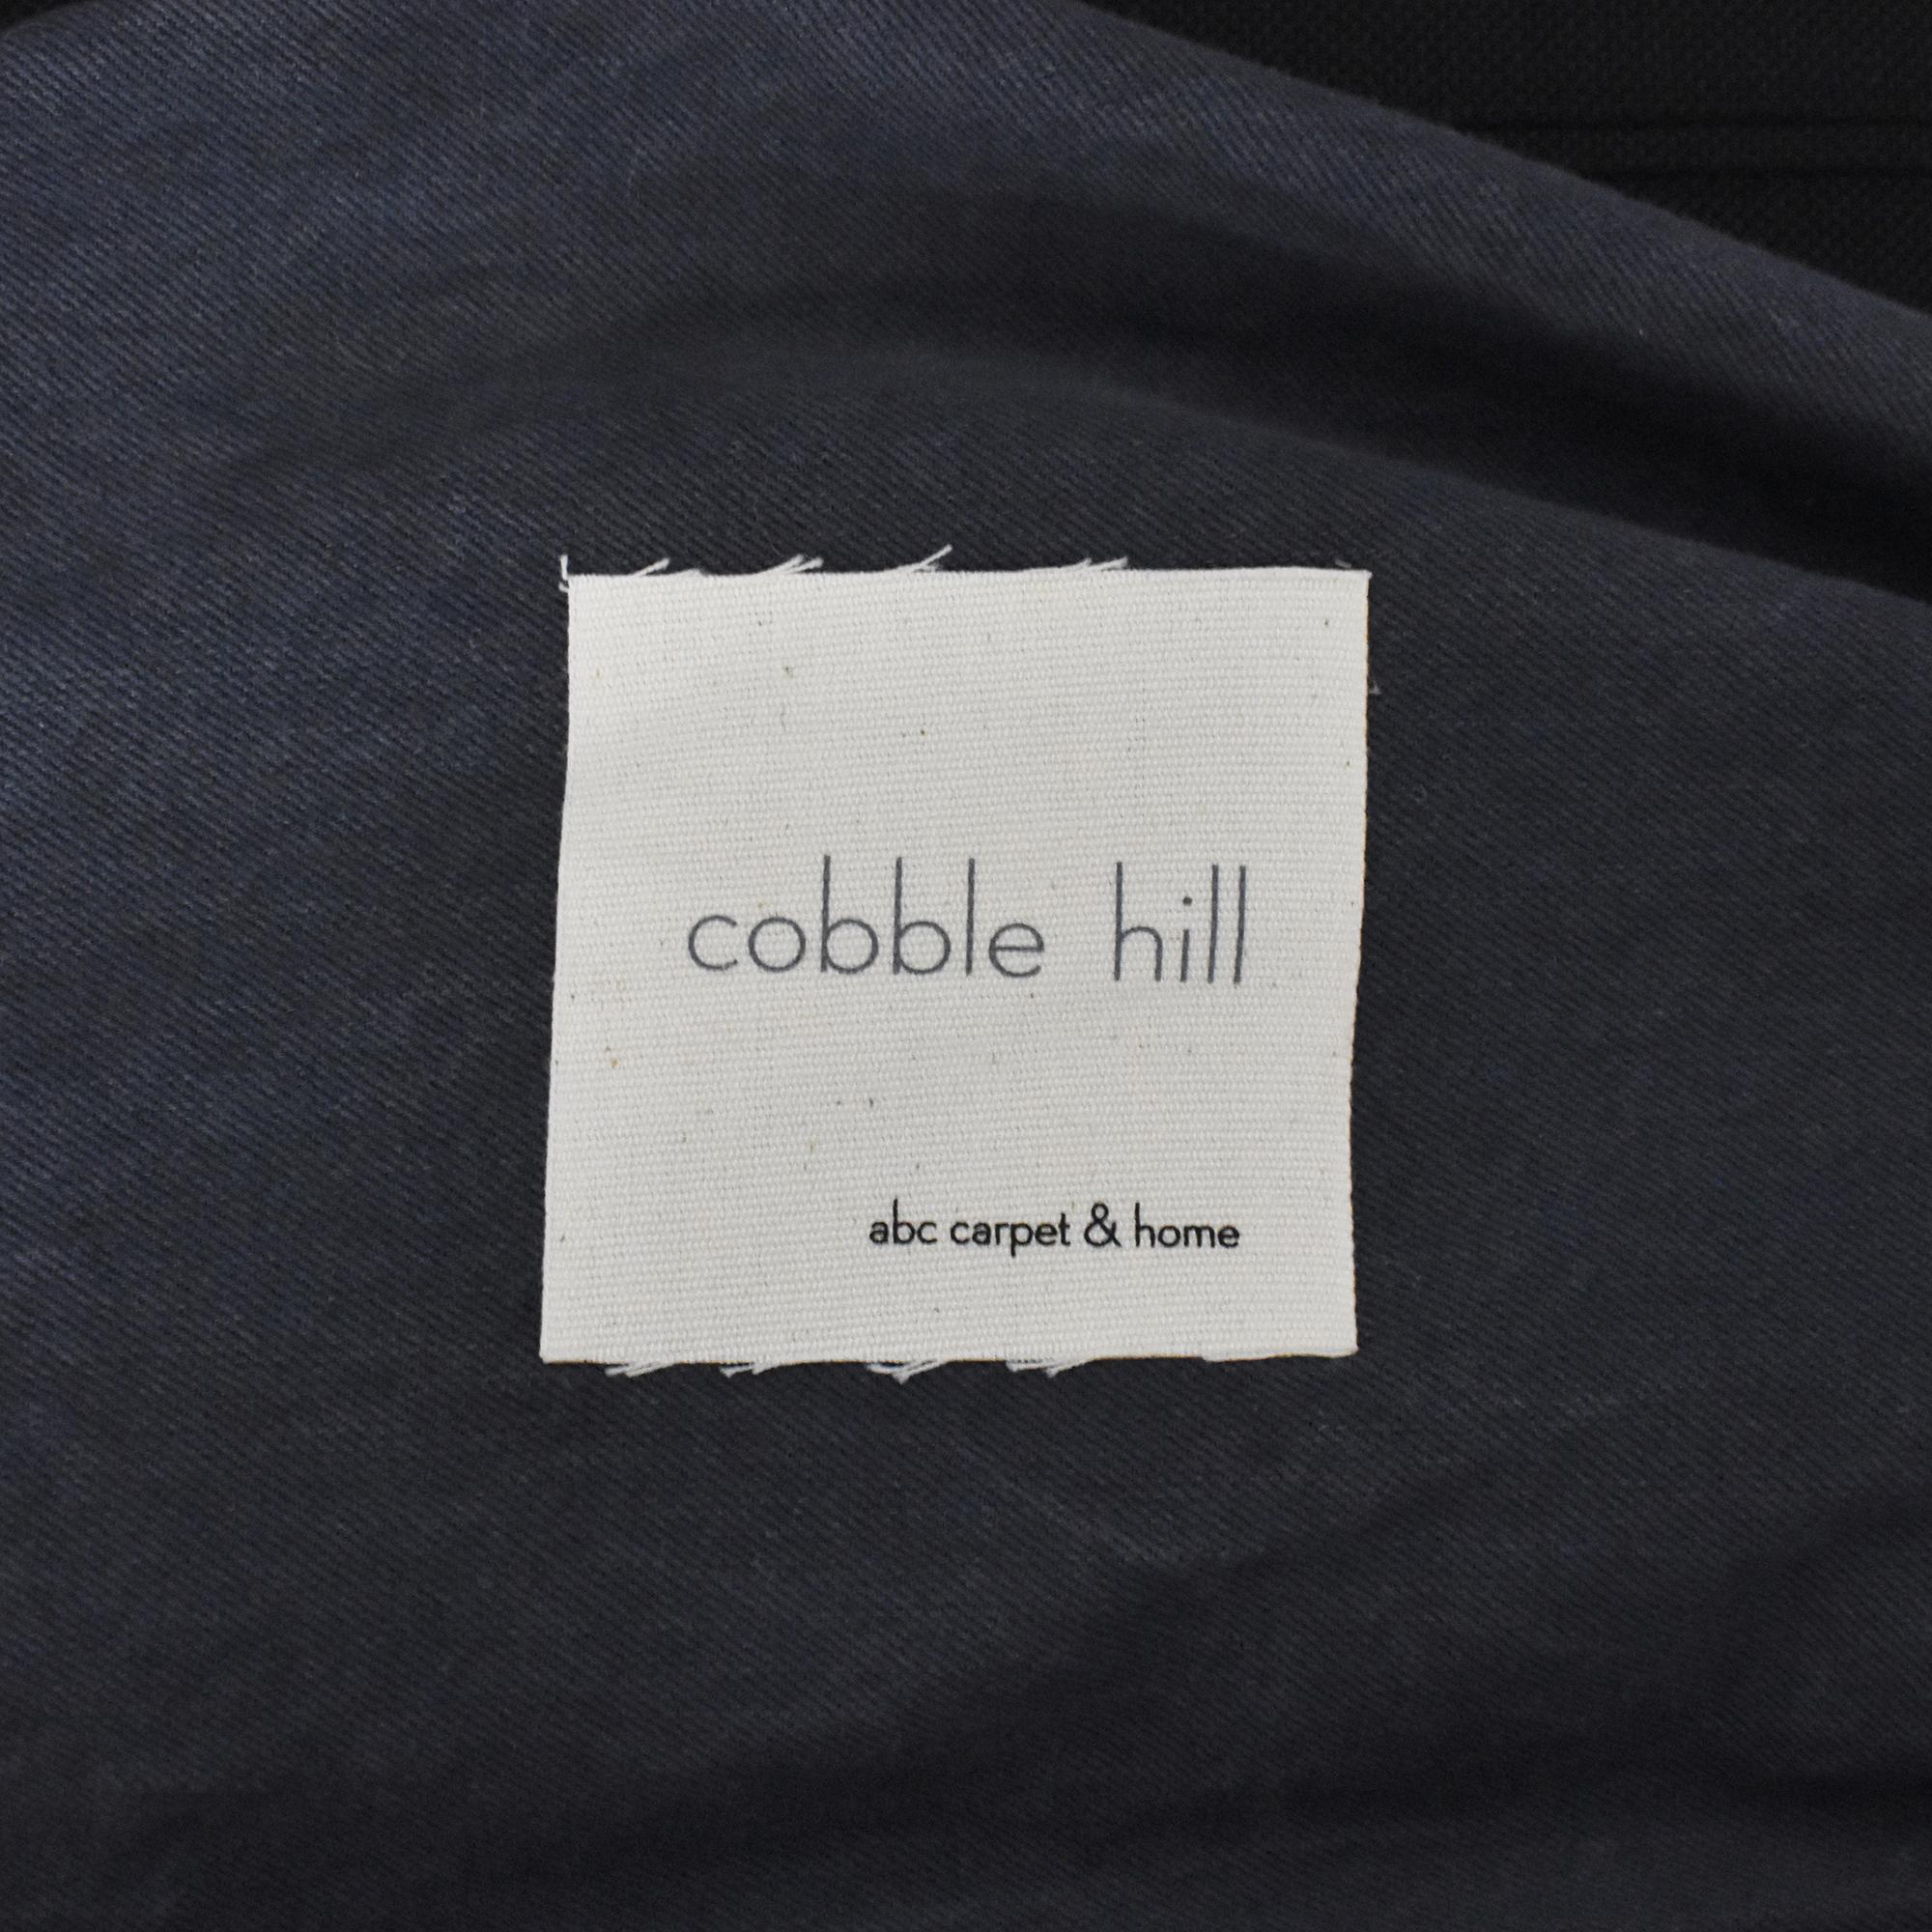 ABC Carpet & Home  ABC Carpet & Home Cobble Hill Lucali Sleeper Sectional blue